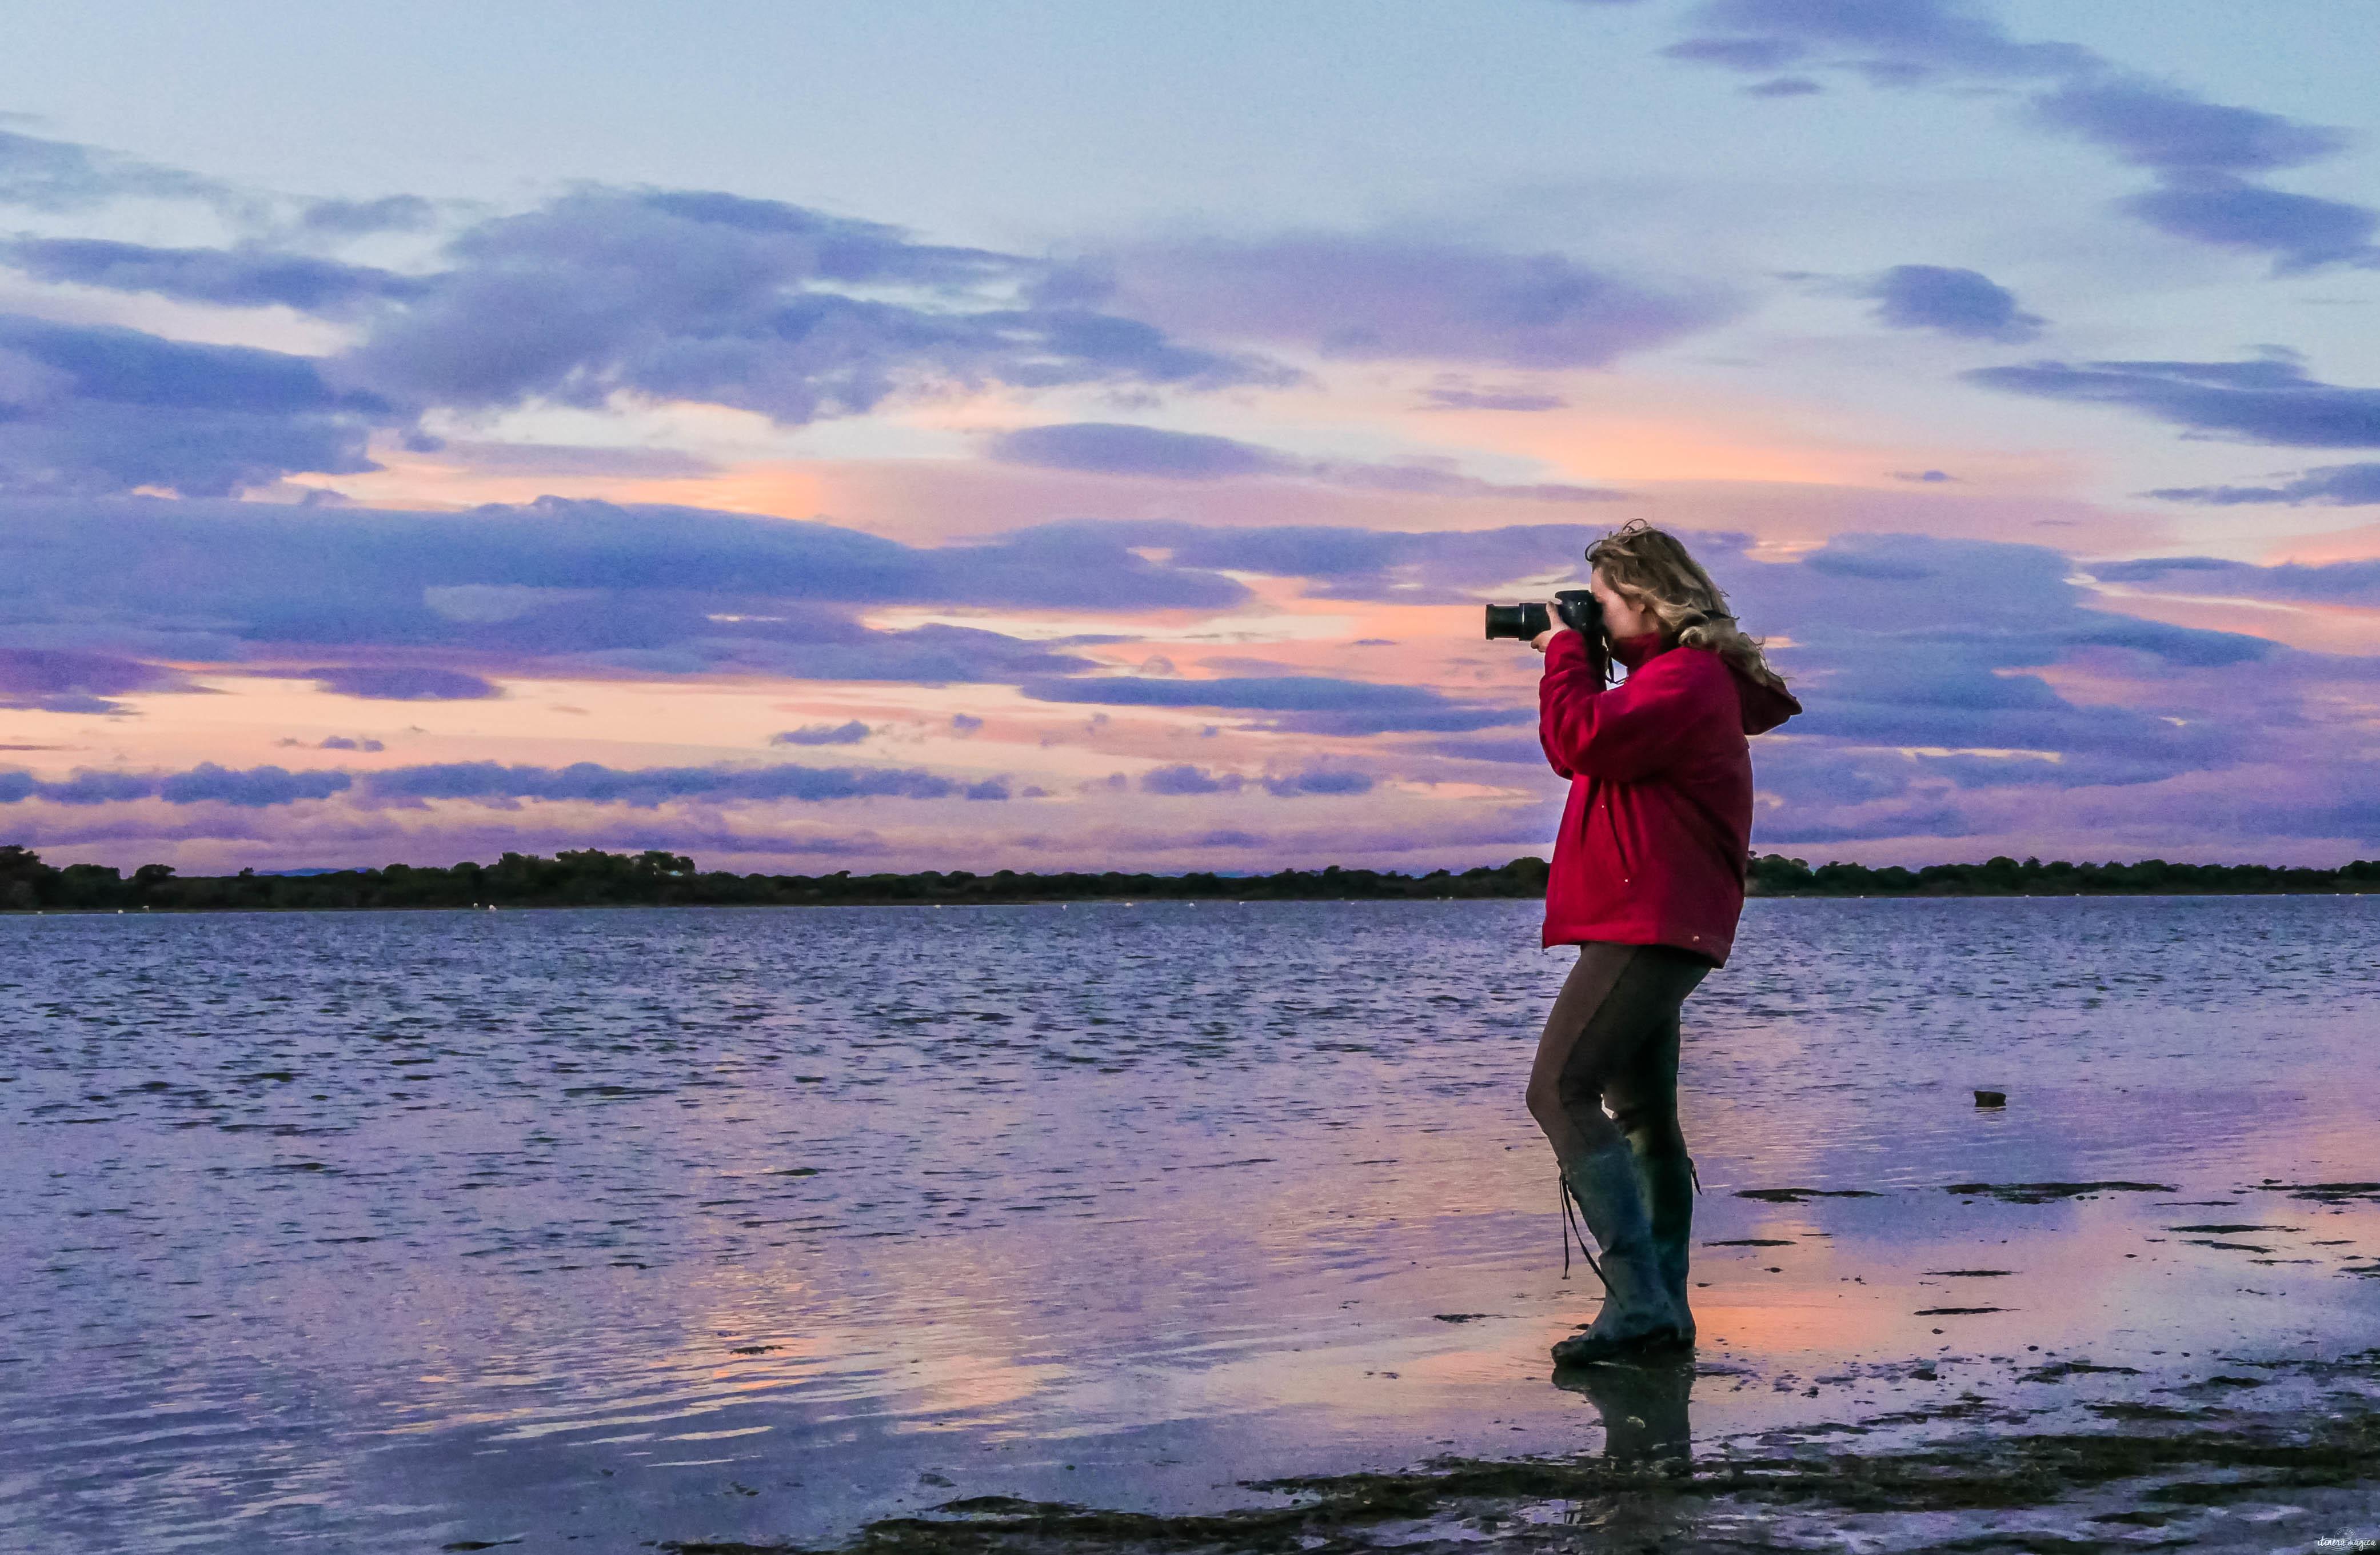 ariane fornia photographe